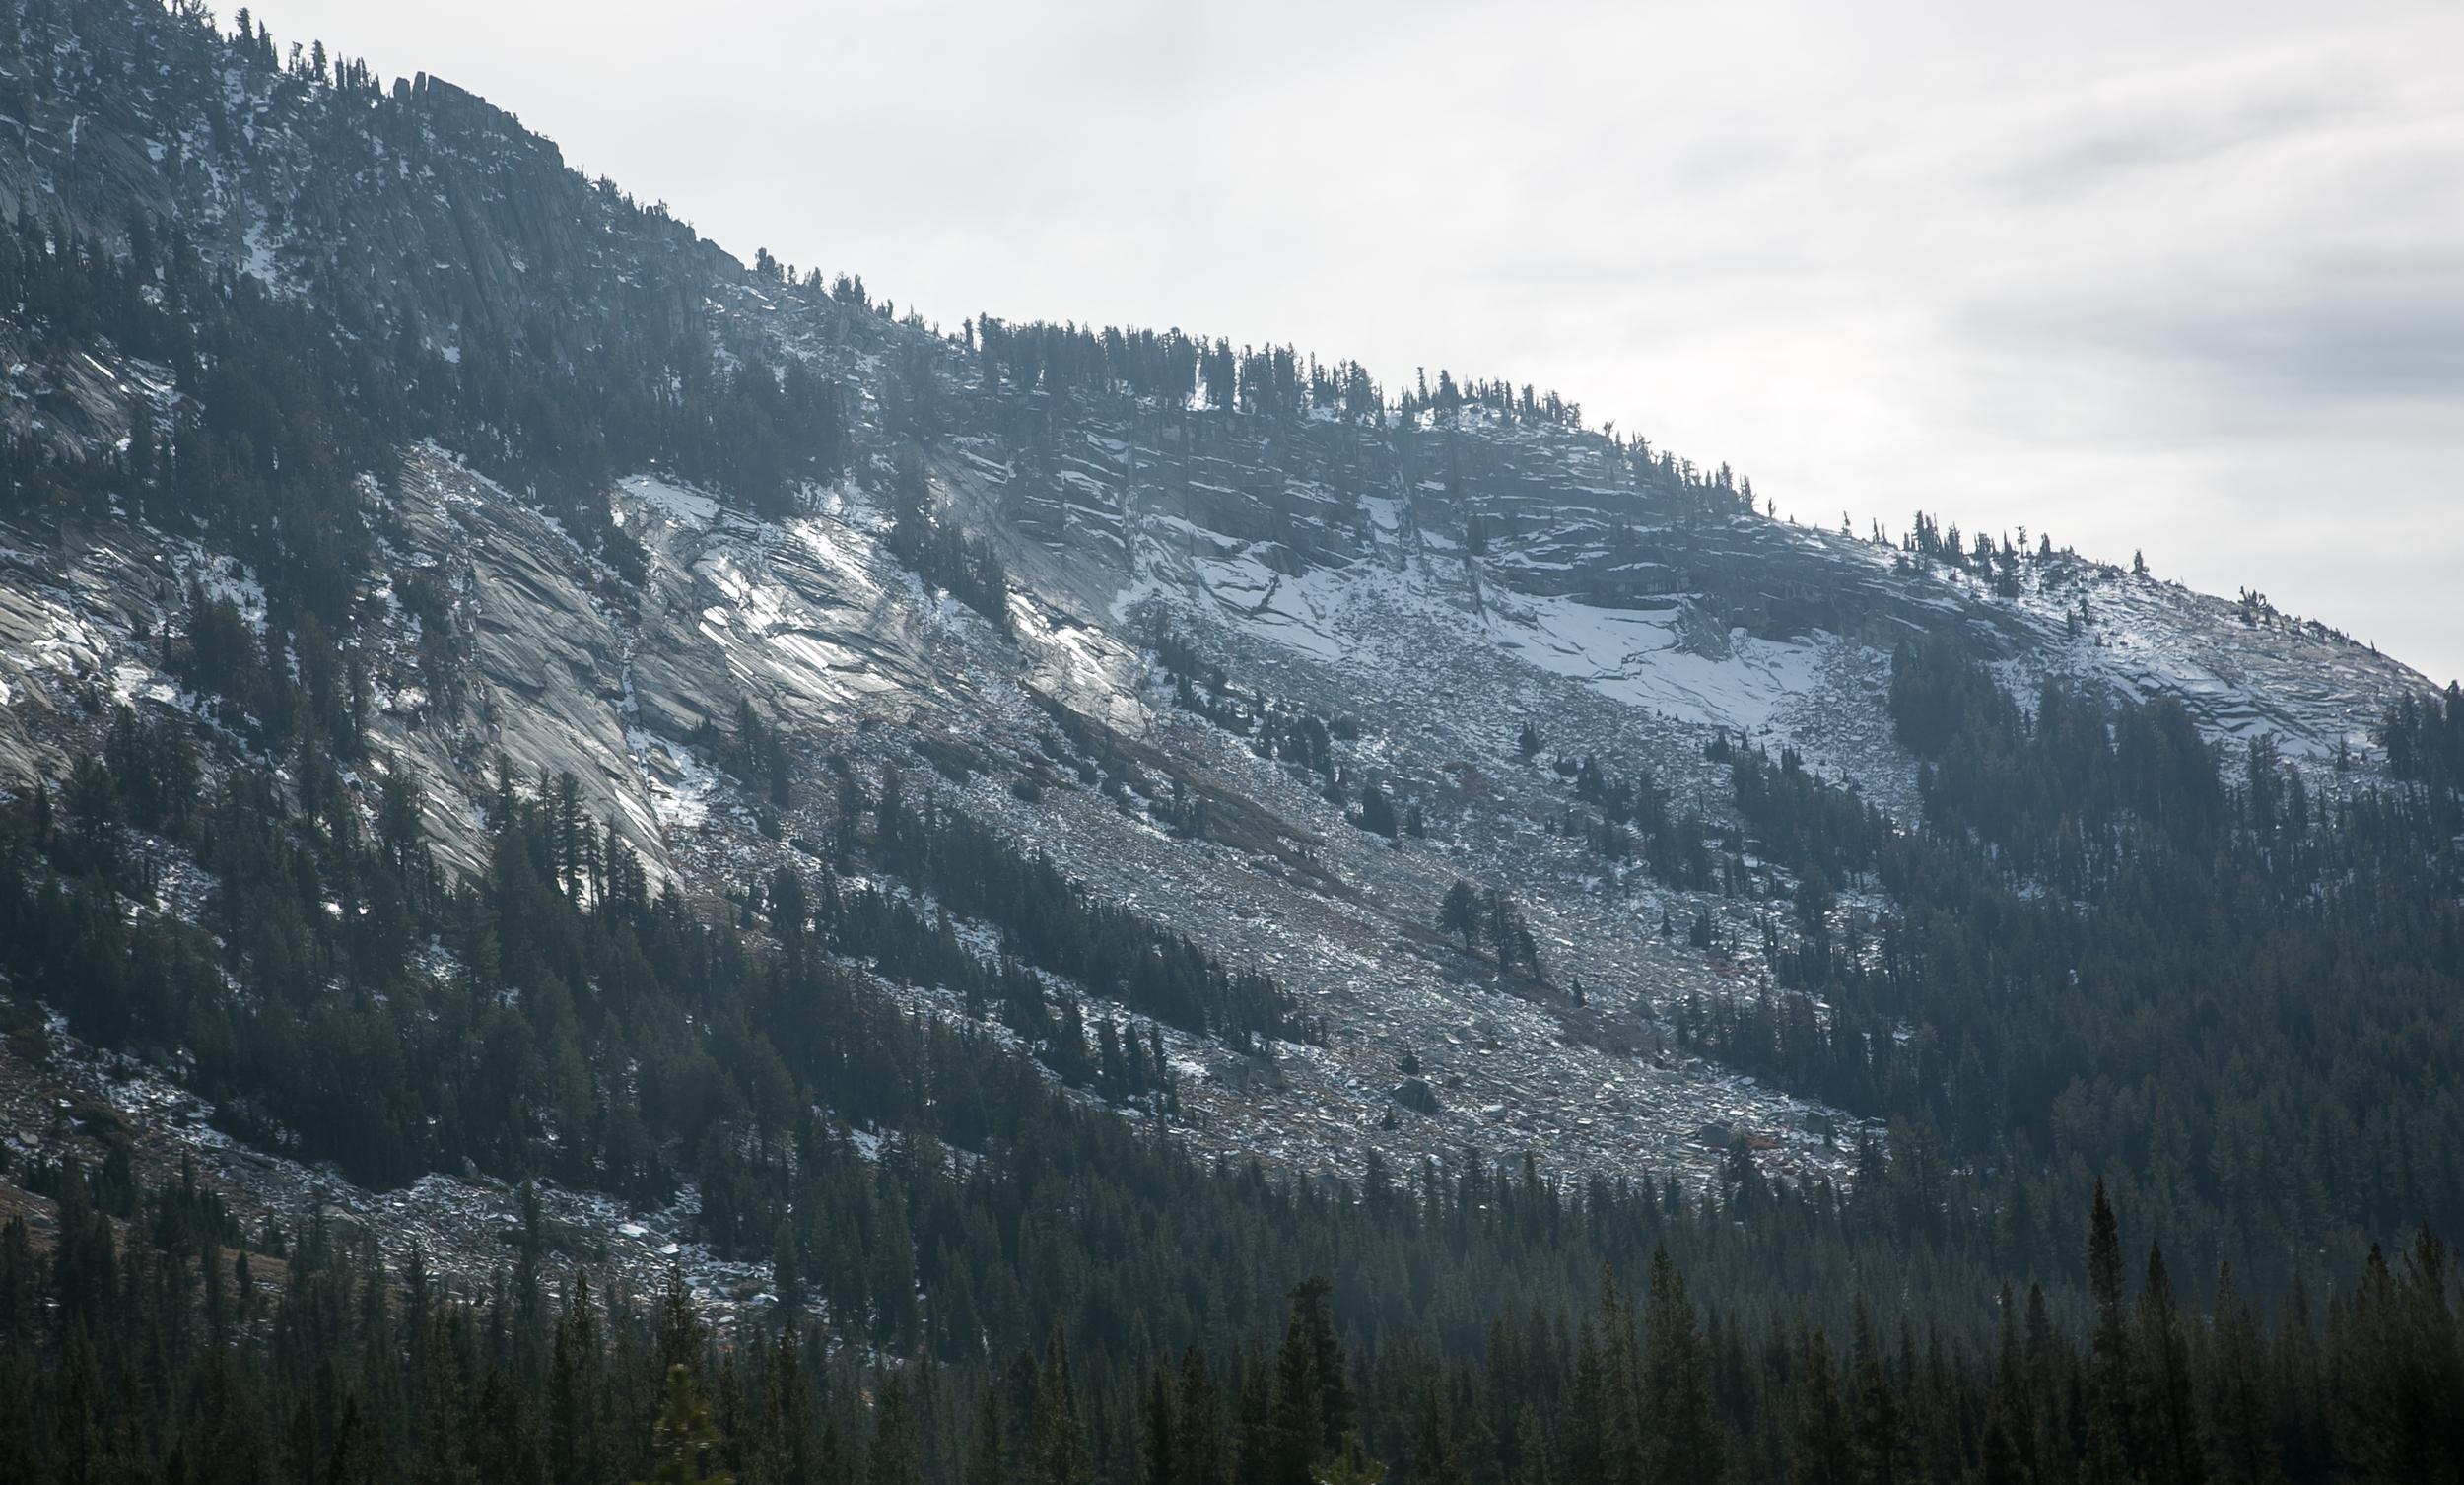 Tuolumne Meadows, Sierra Nevada. California.